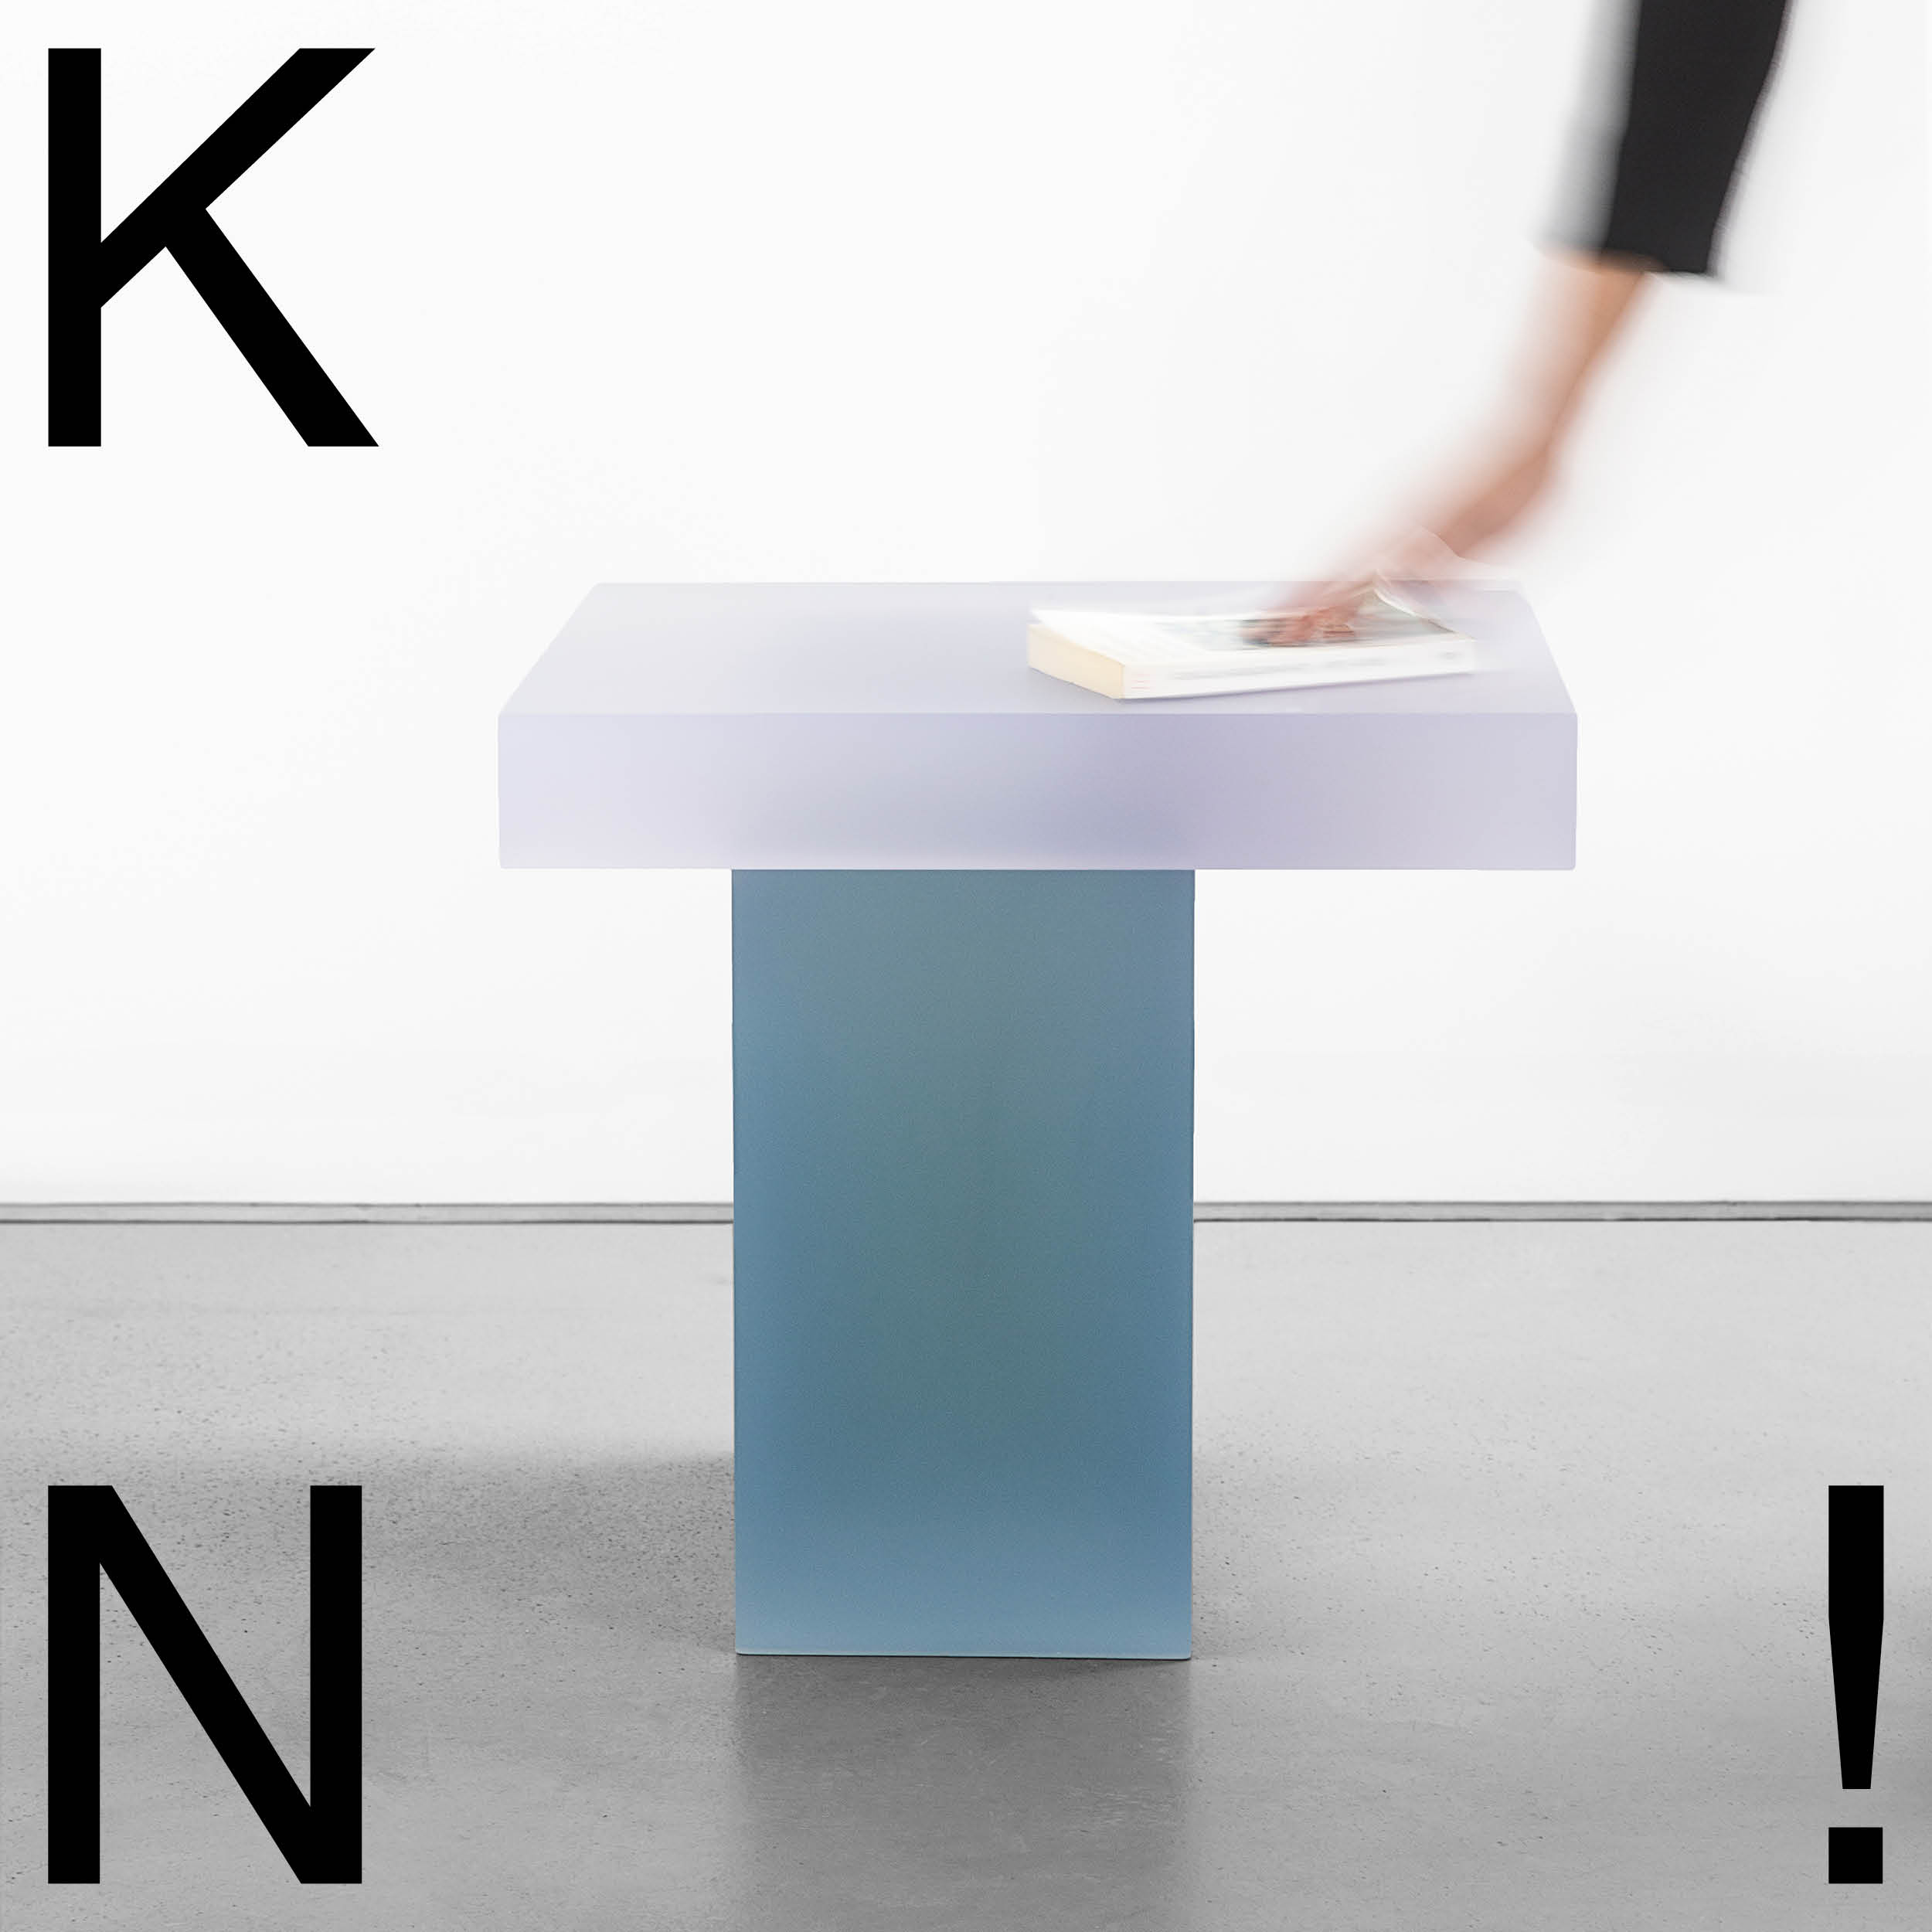 KN_teaser.jpg